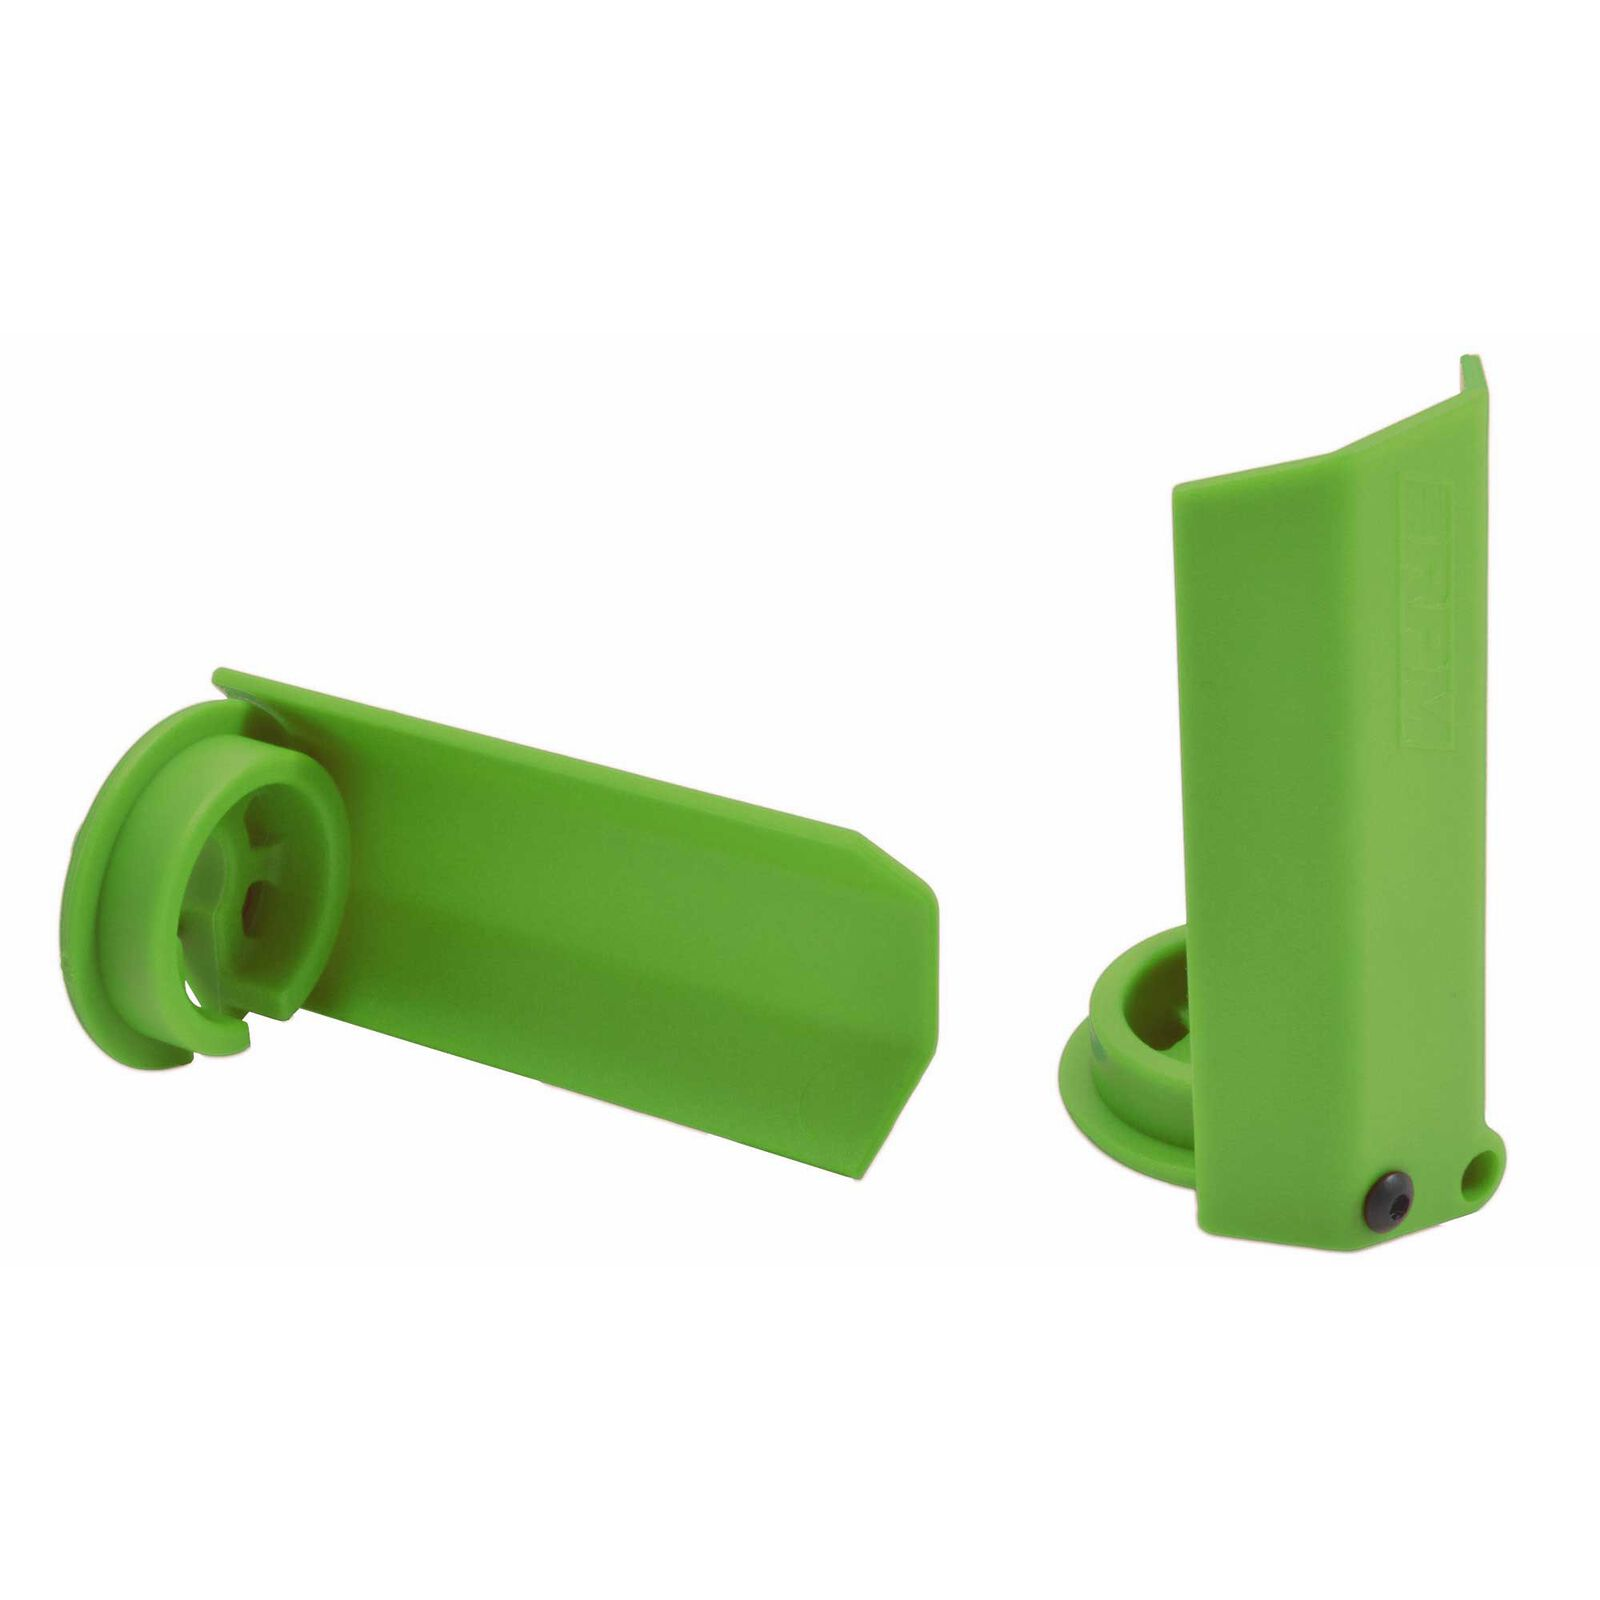 Shock Shaft Guards, Green: Traxxas X-Maxx